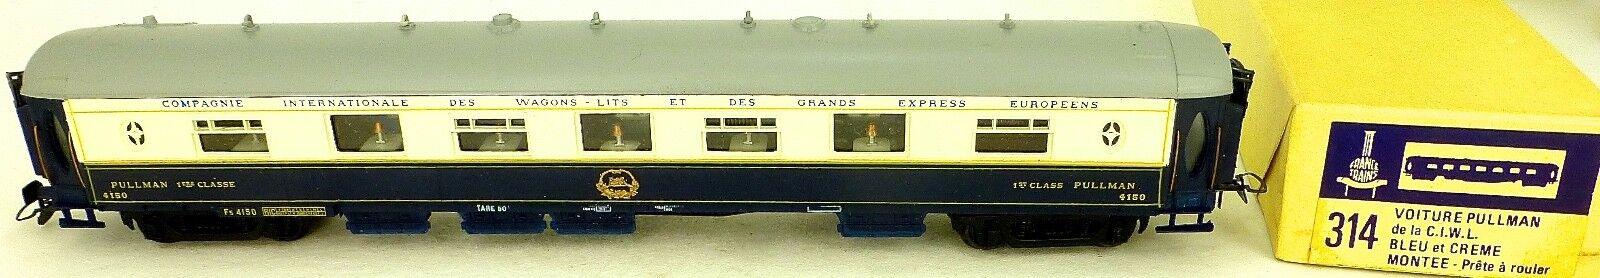 Crema azzurra Pulluomo 1ere cl 4150 Francia treni 314 h0 1 87 pack